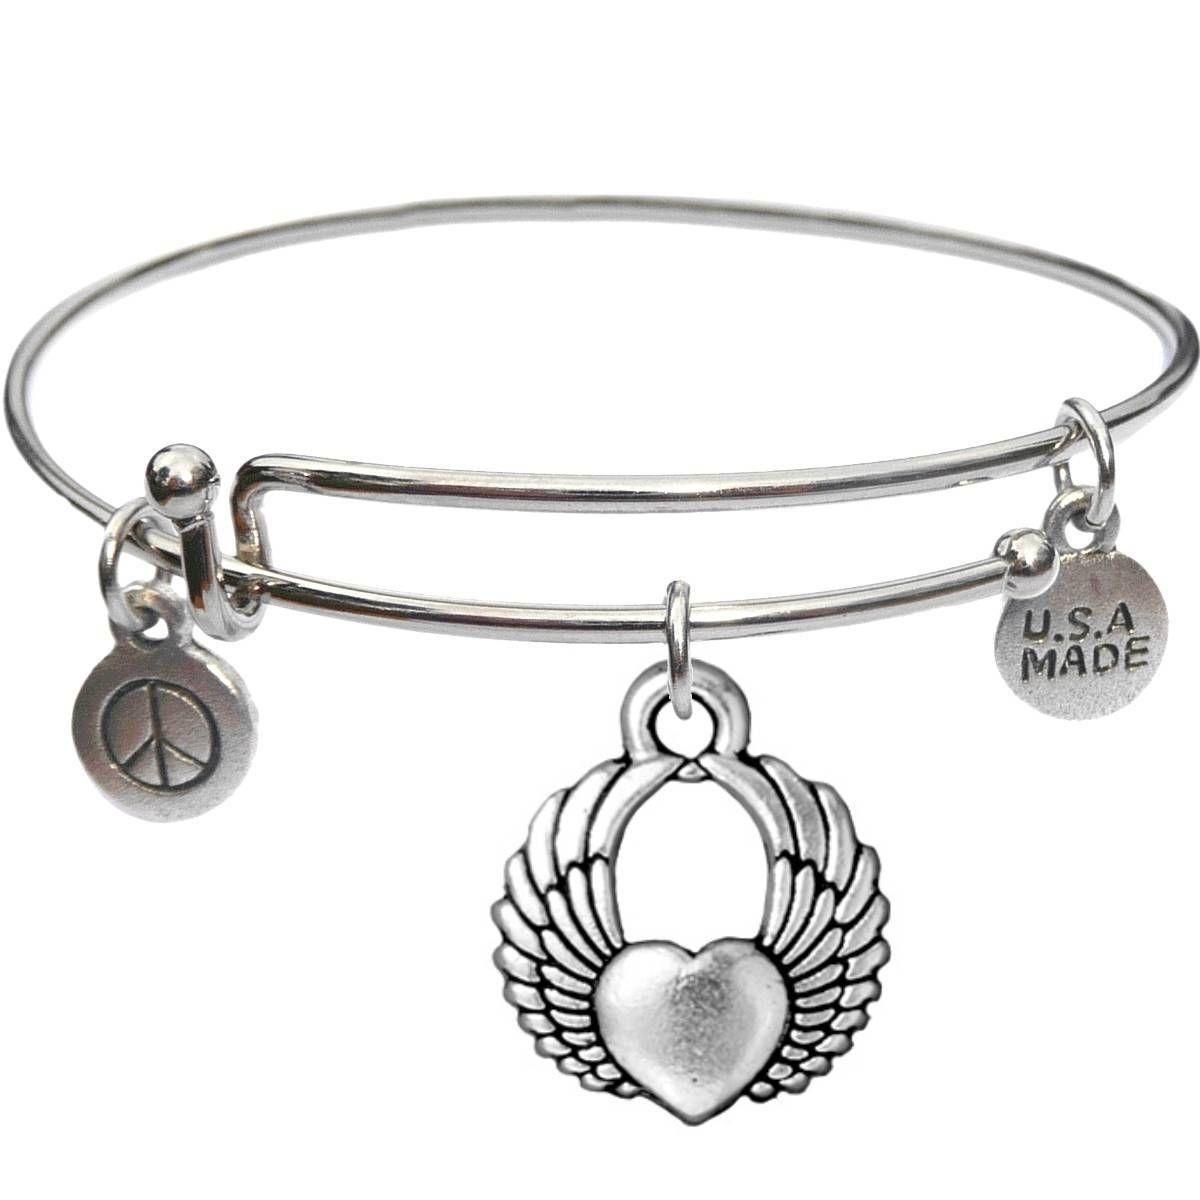 Bangle Bracelet and Winged Heart - USA Made - BBandJT159